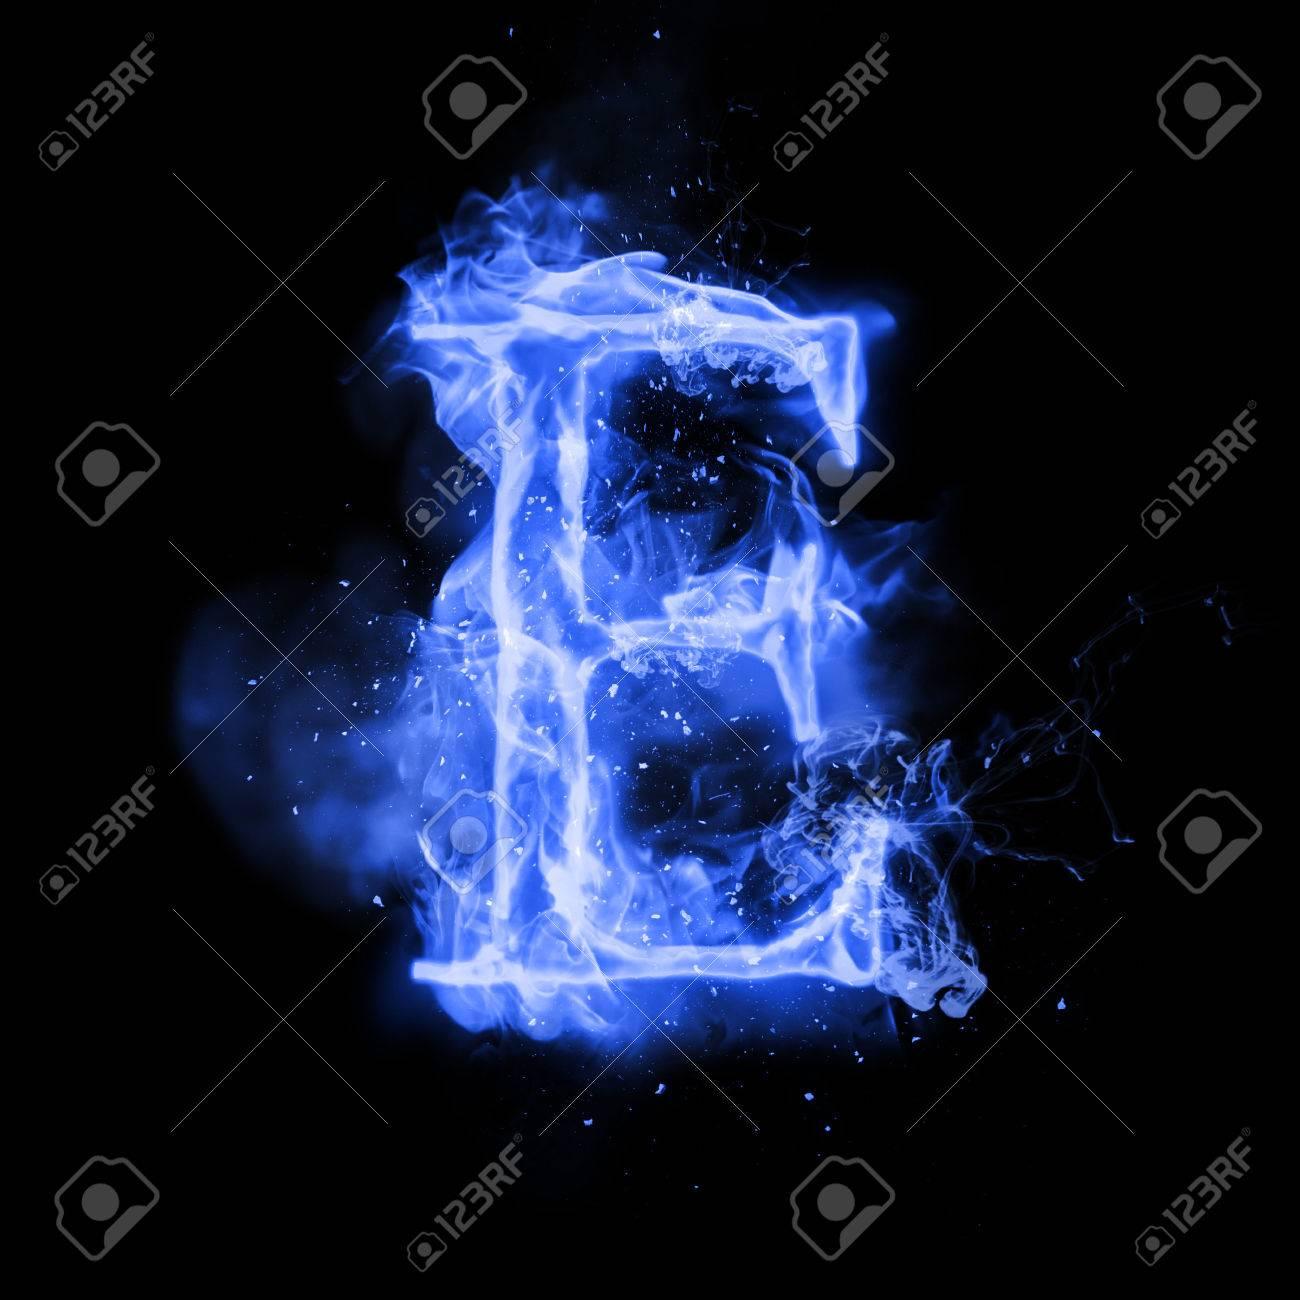 Fire Letter E Of Burning Blue Flame Flaming Burn Font Or Bonfire